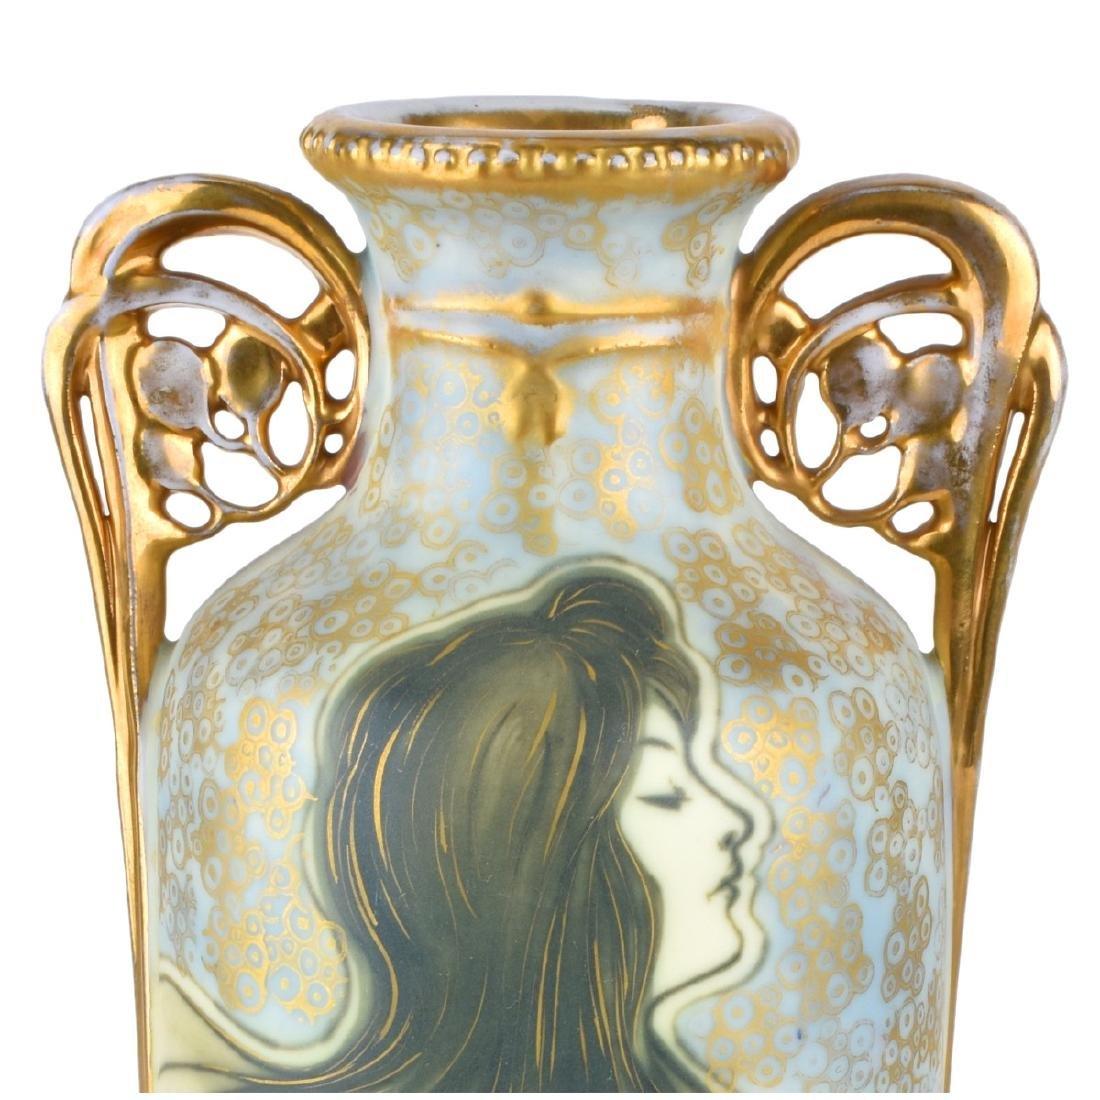 Turn Teplitz Vase with Maidens - 2